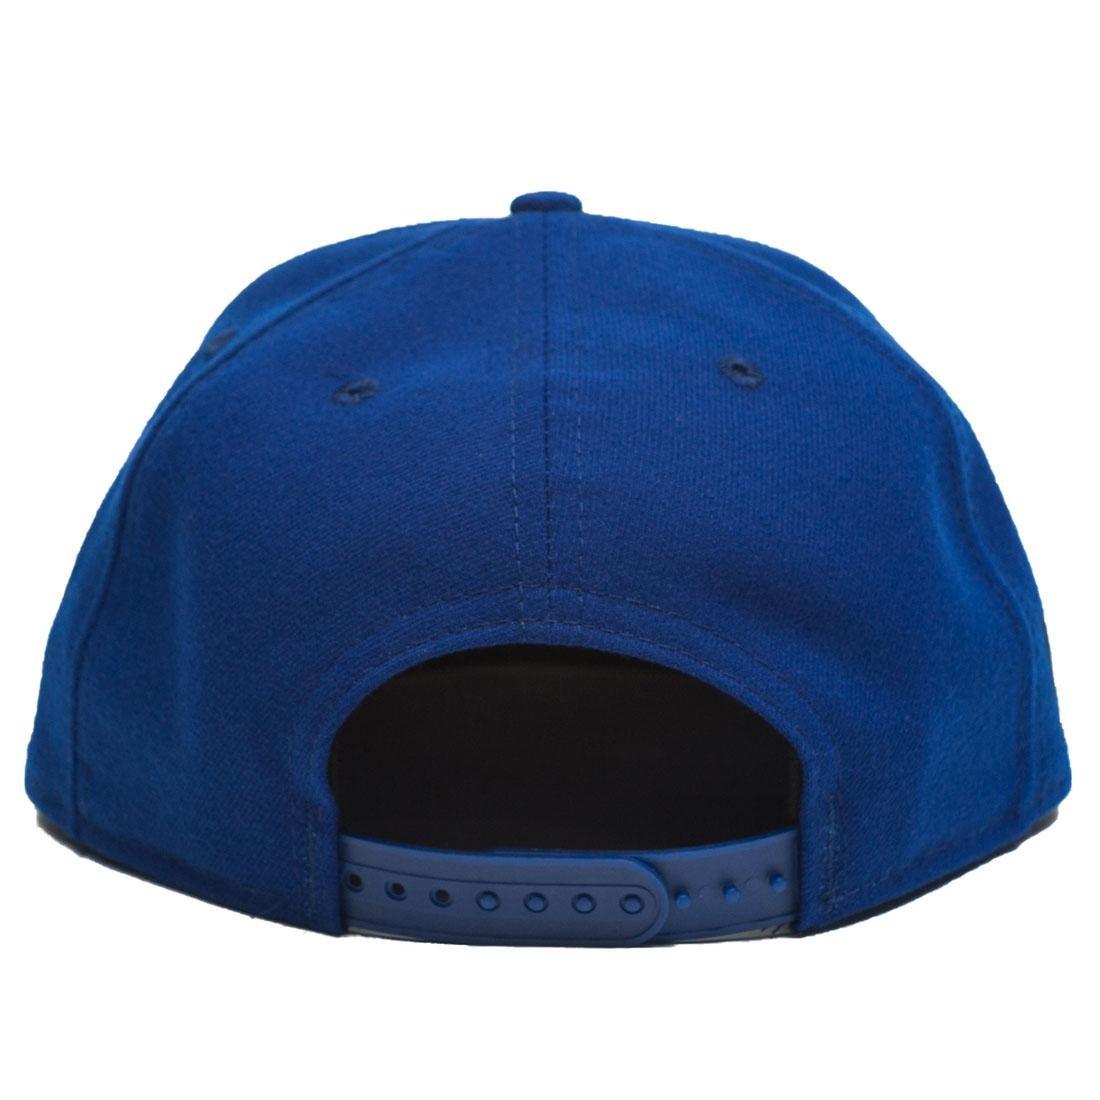 35fdd24f0 BAIT x NBA X New Era 9Fifty New York Knicks Alt Royal Snapback Cap (blue)